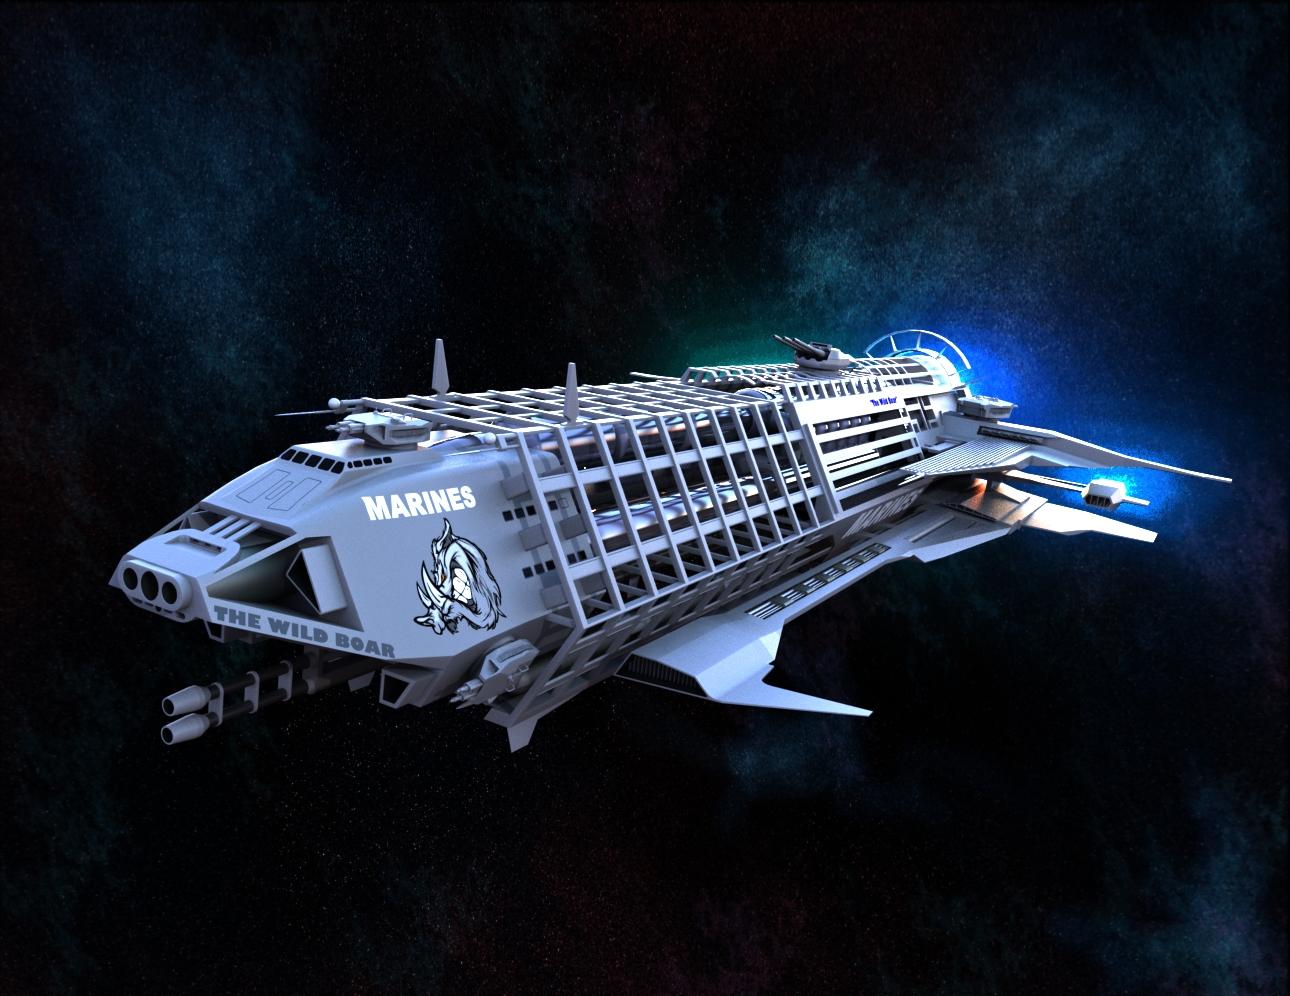 The Wild Boar科幻宇宙飞船3D图纸 Solidworks设计